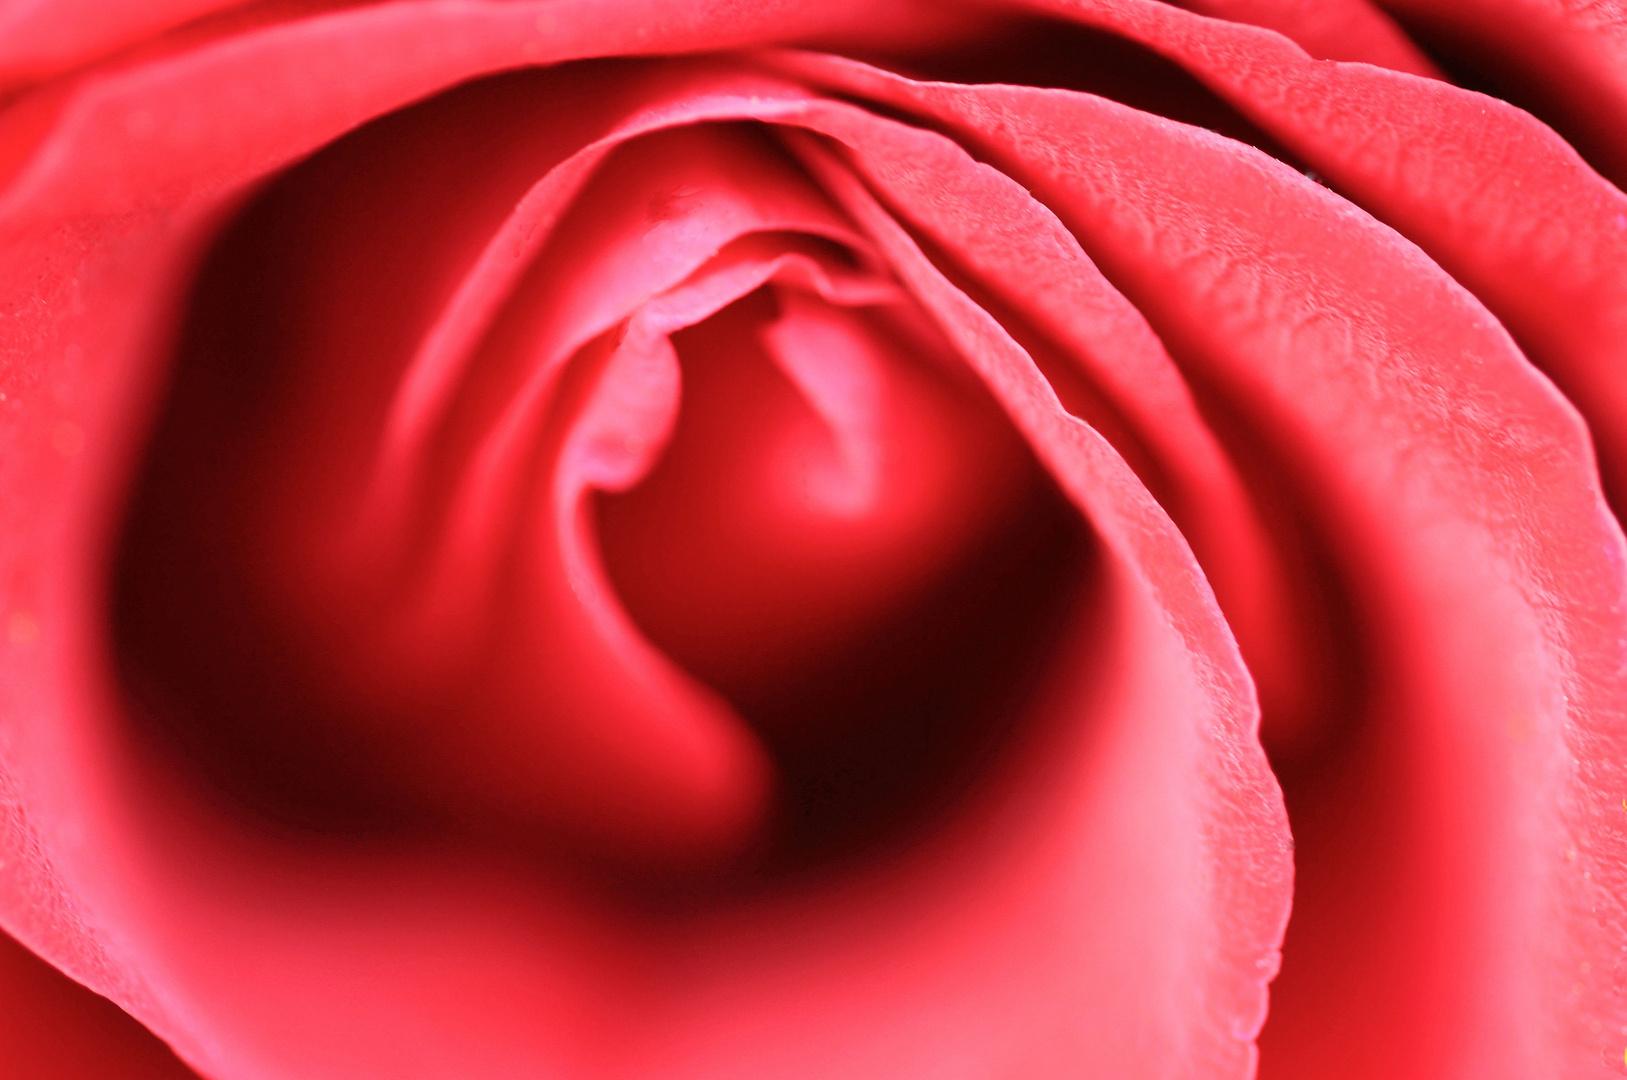 Rose fleischig